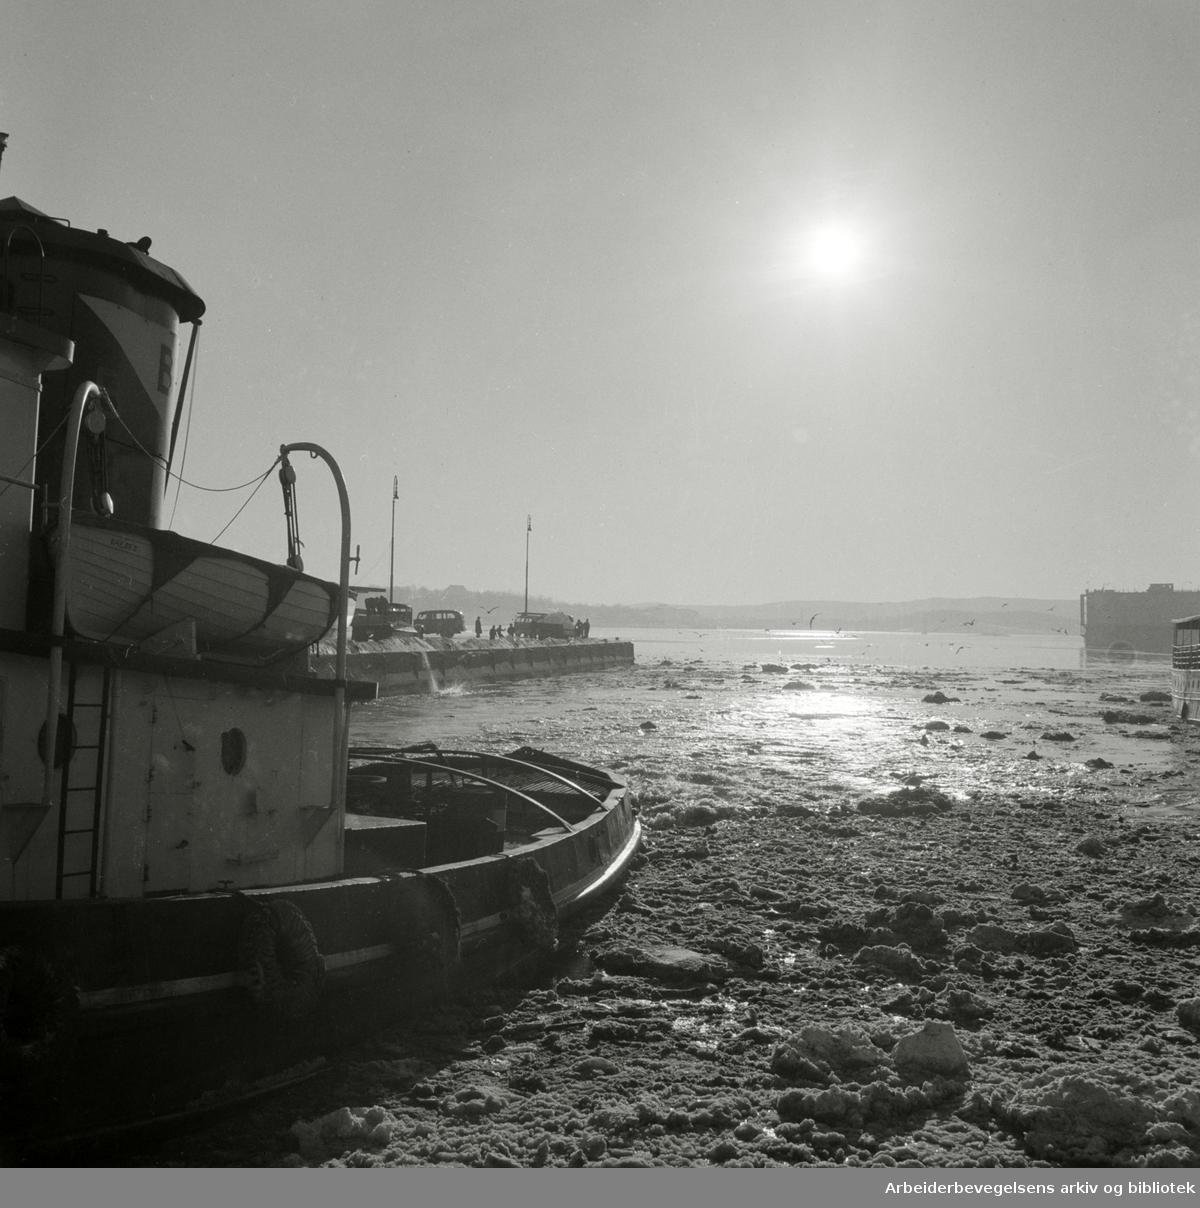 Vinter i Oslo. Isbryter i Oslo havn. Mars 1954.